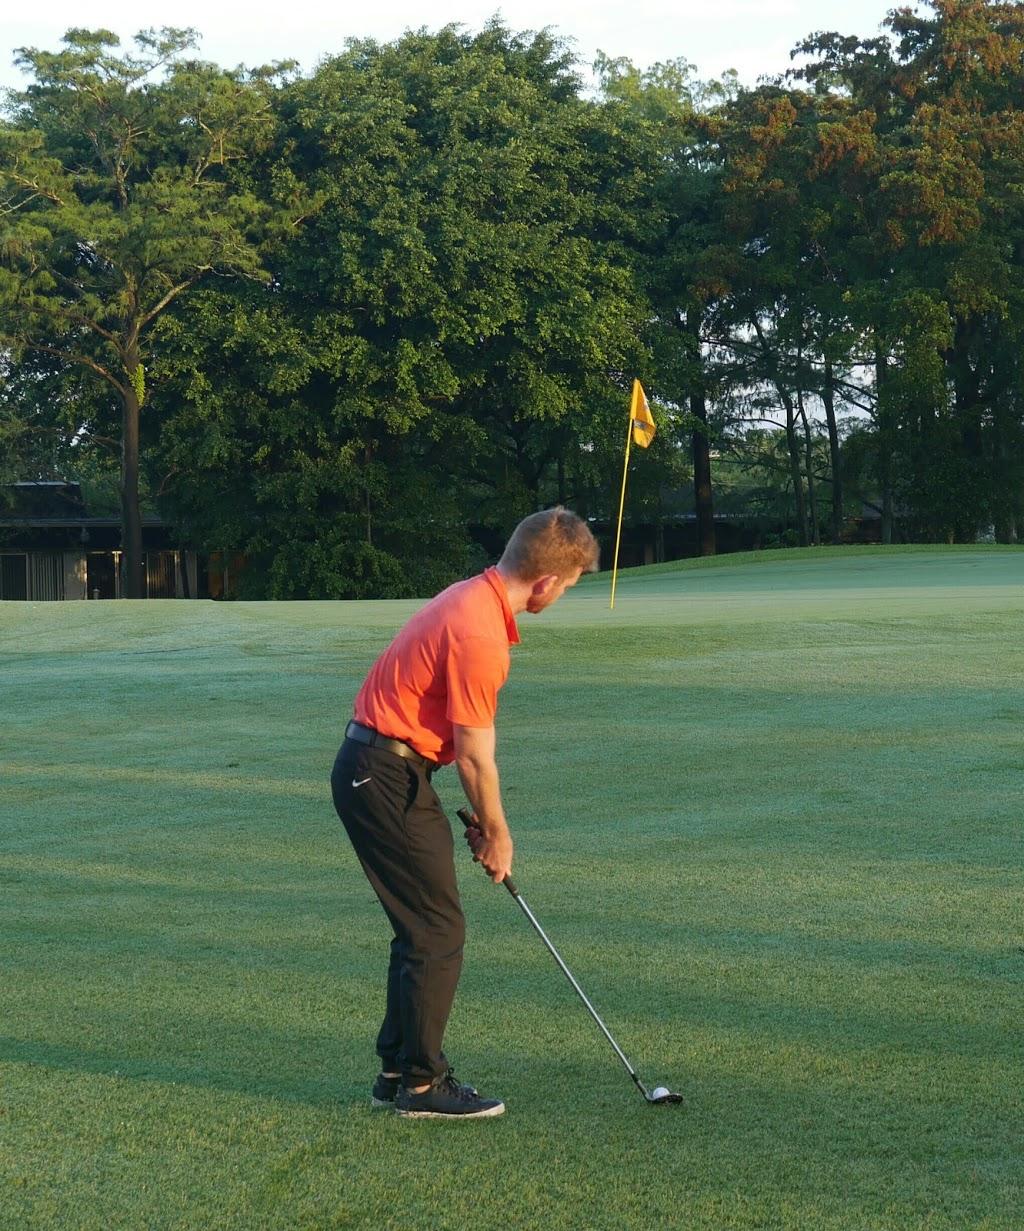 Duncan Smith Golf Instruction - school  | Photo 3 of 10 | Address: 7050 W Broward Blvd, Plantation, FL 33317, USA | Phone: (954) 854-2020